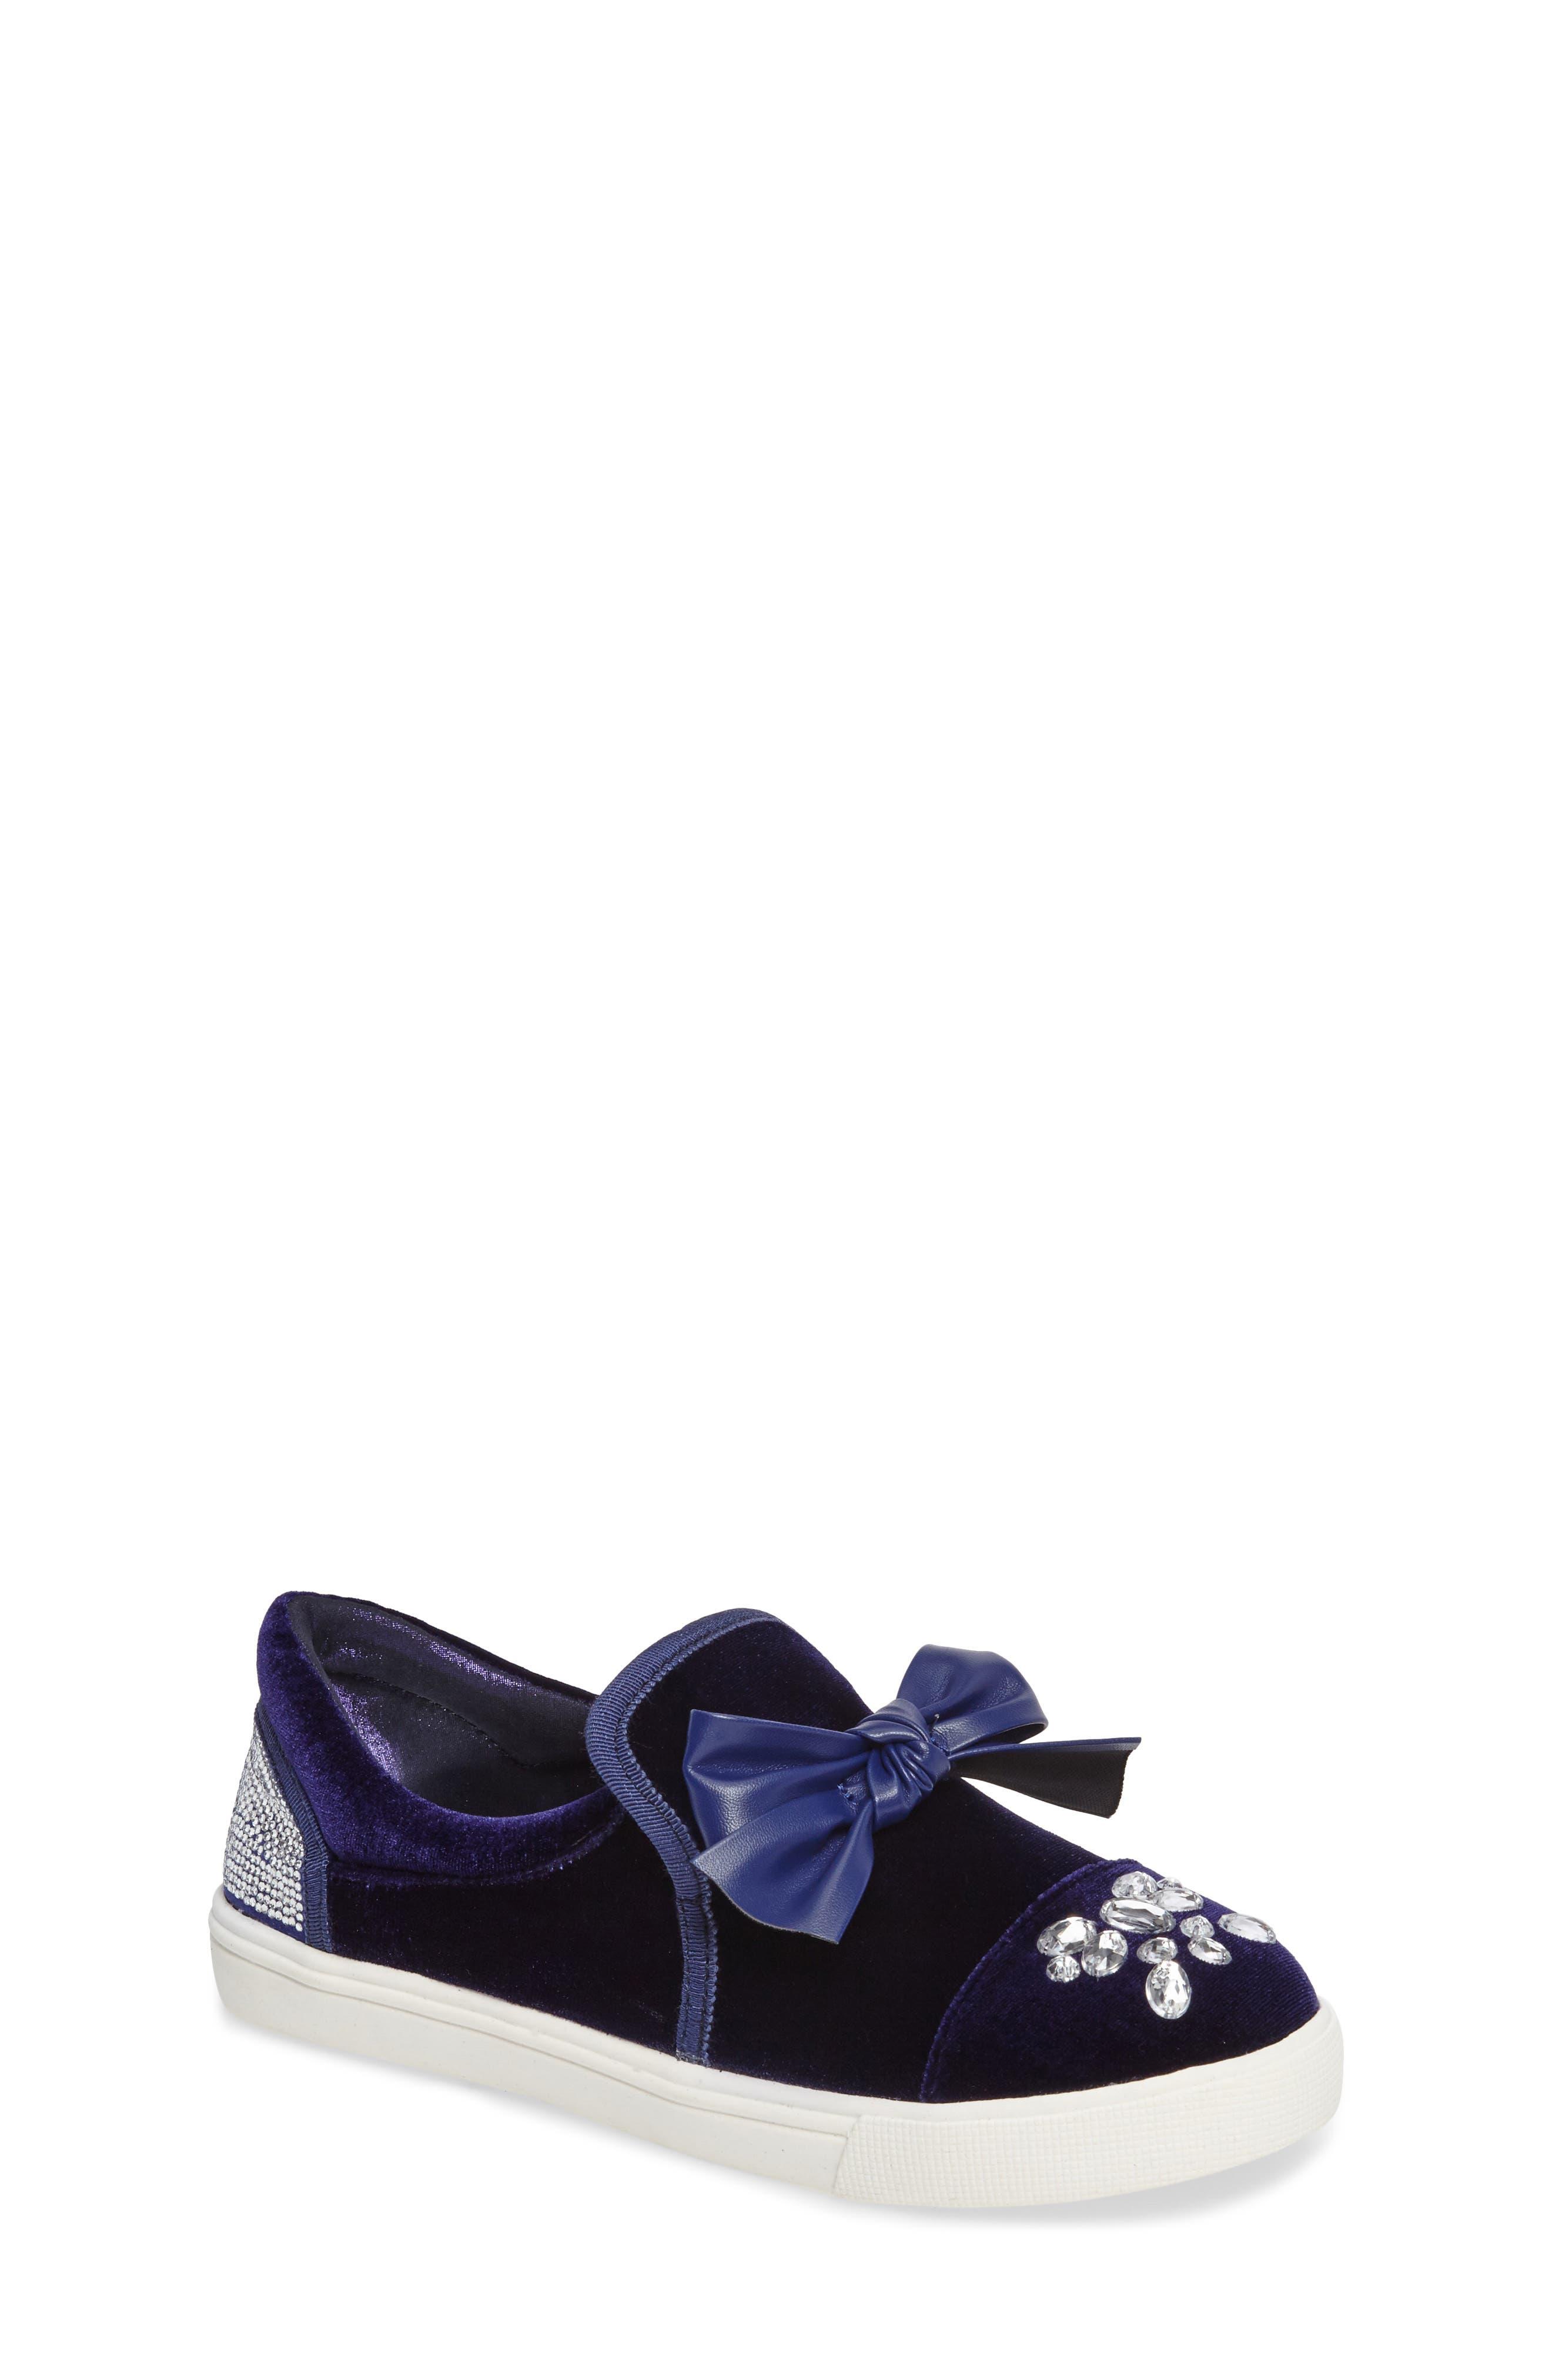 Delight Embellished Slip-On Sneaker,                             Main thumbnail 1, color,                             410